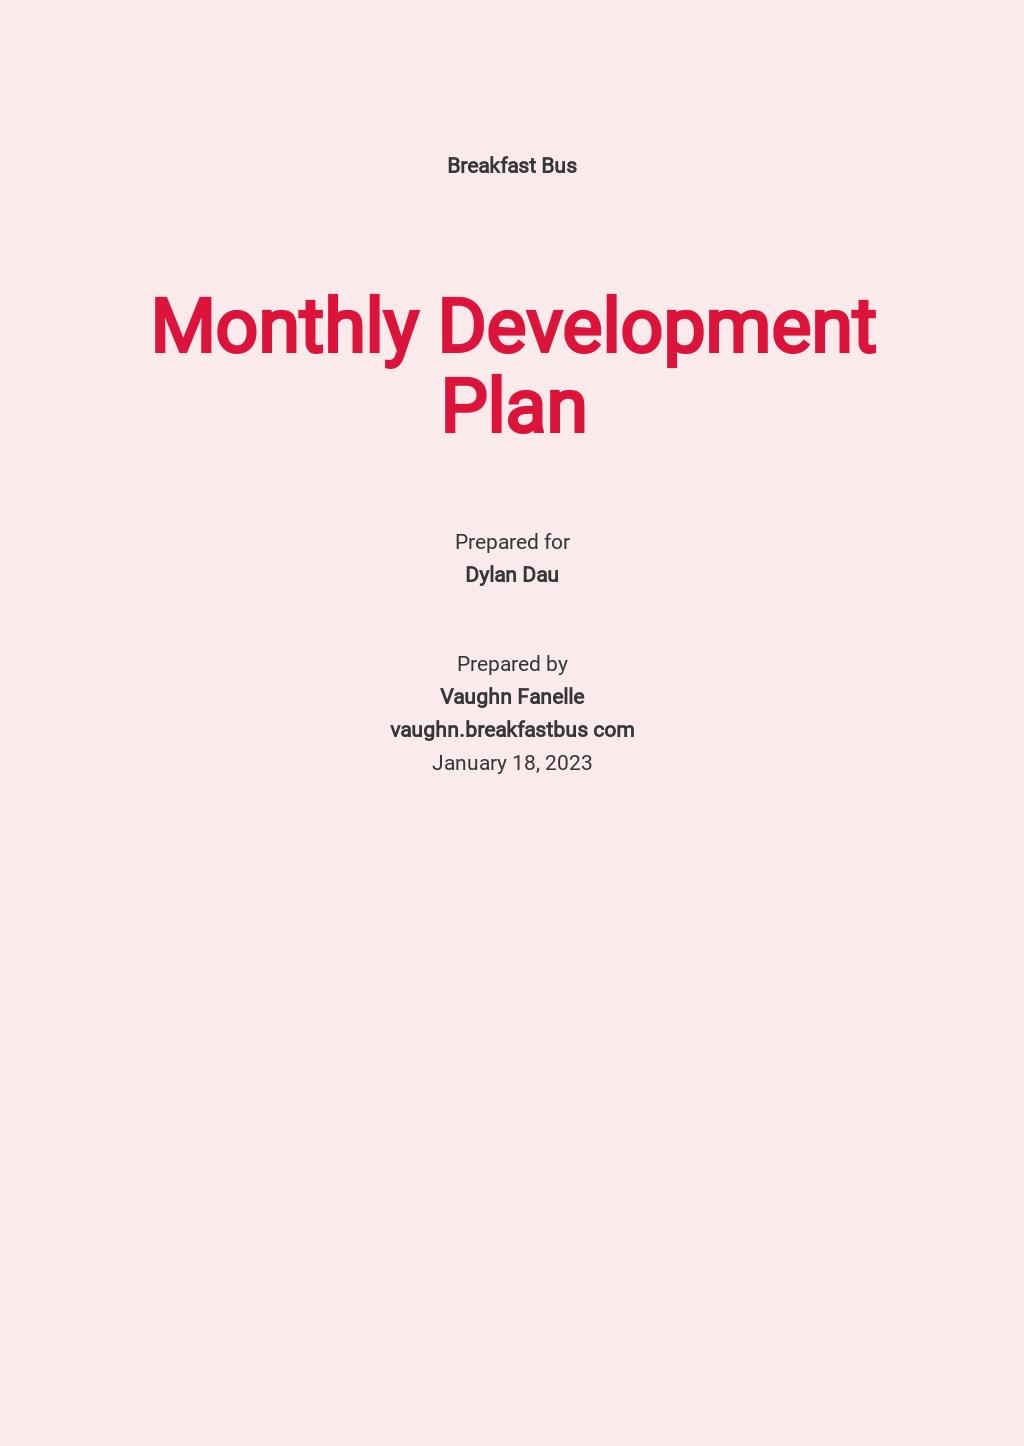 Monthly Development Plan Template